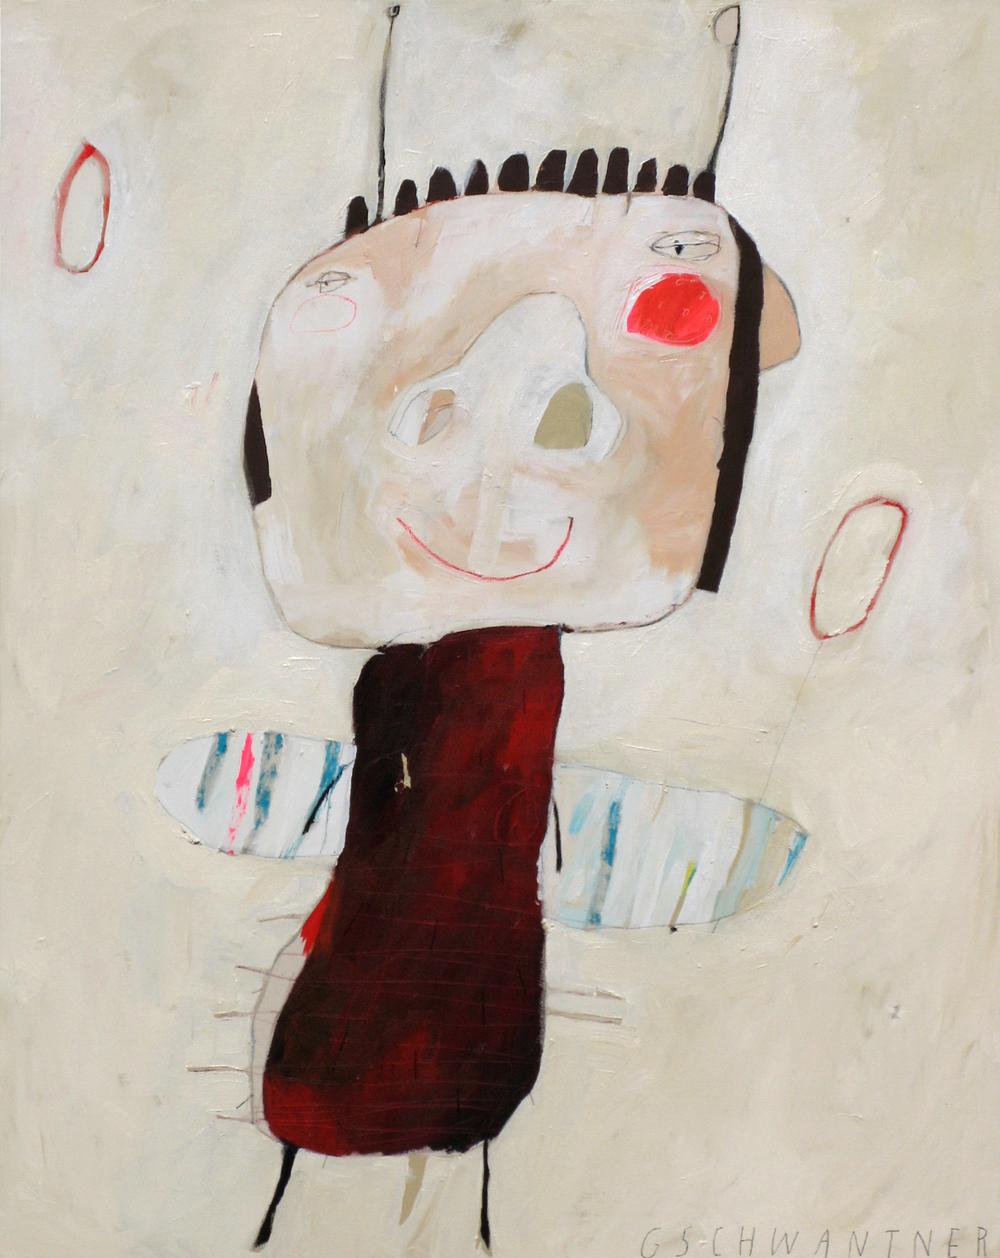 Rotes Herzwesen, 2008, 103 x 133